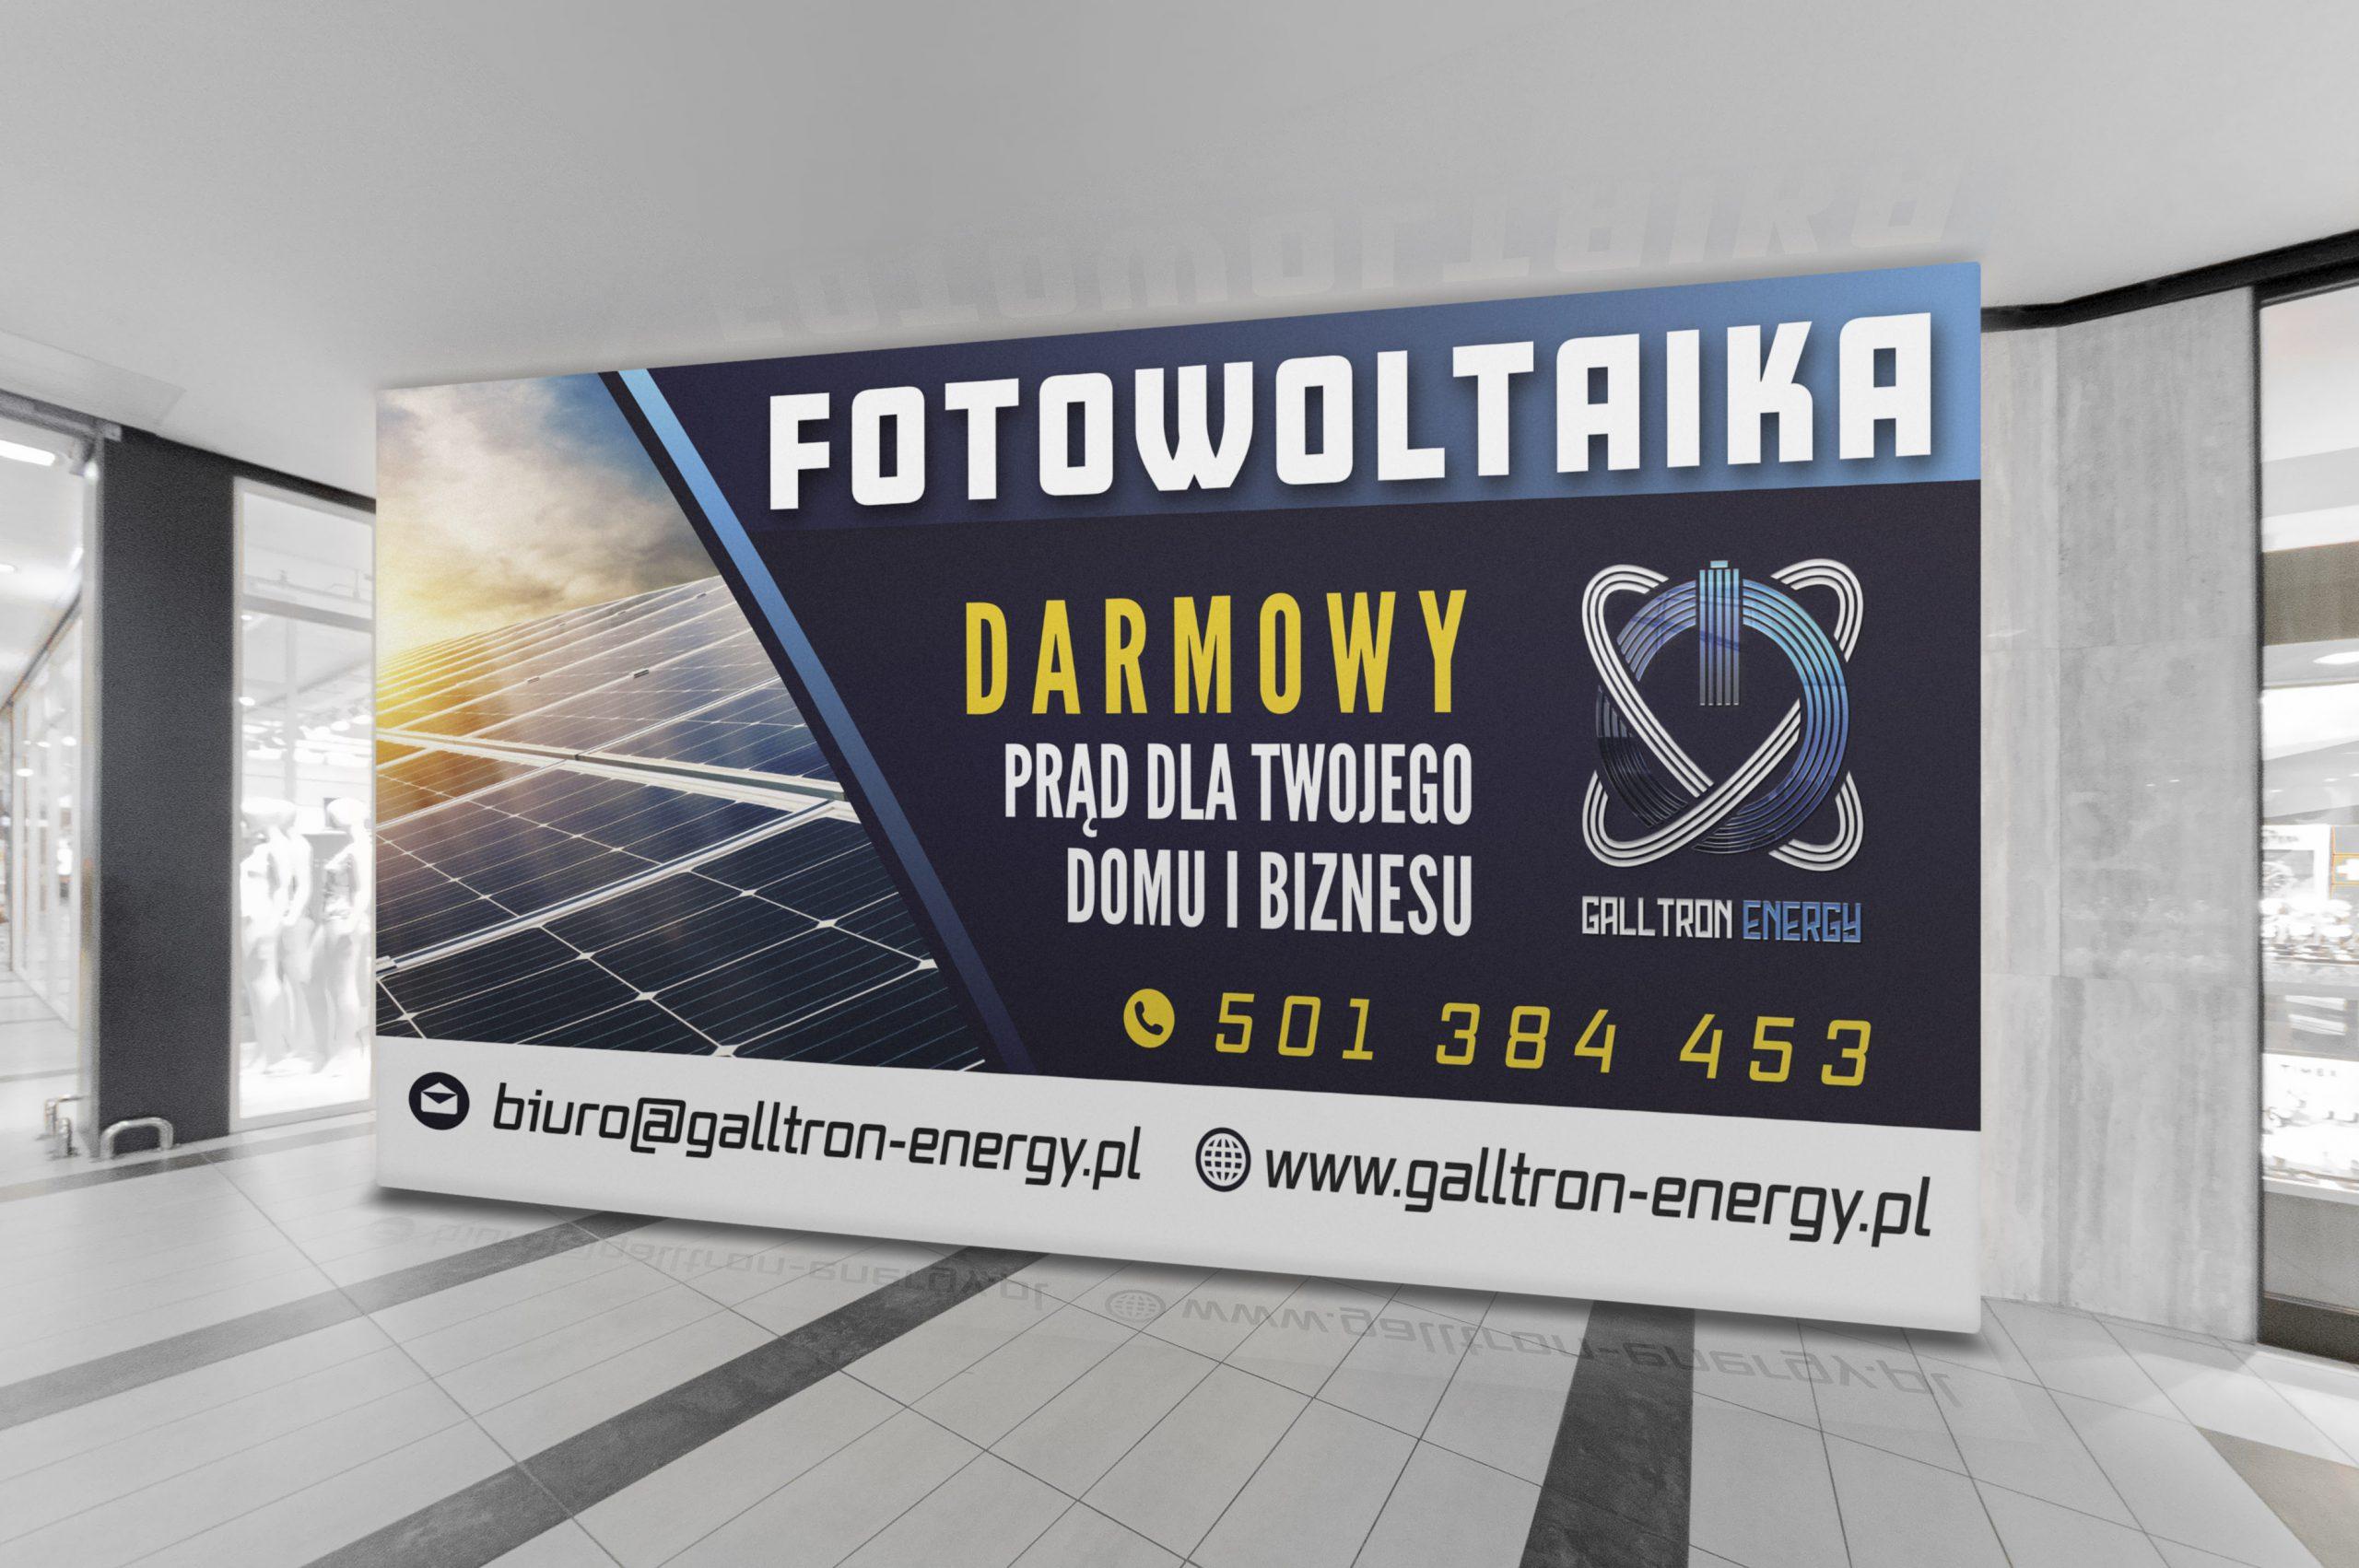 logo fotowoltaika